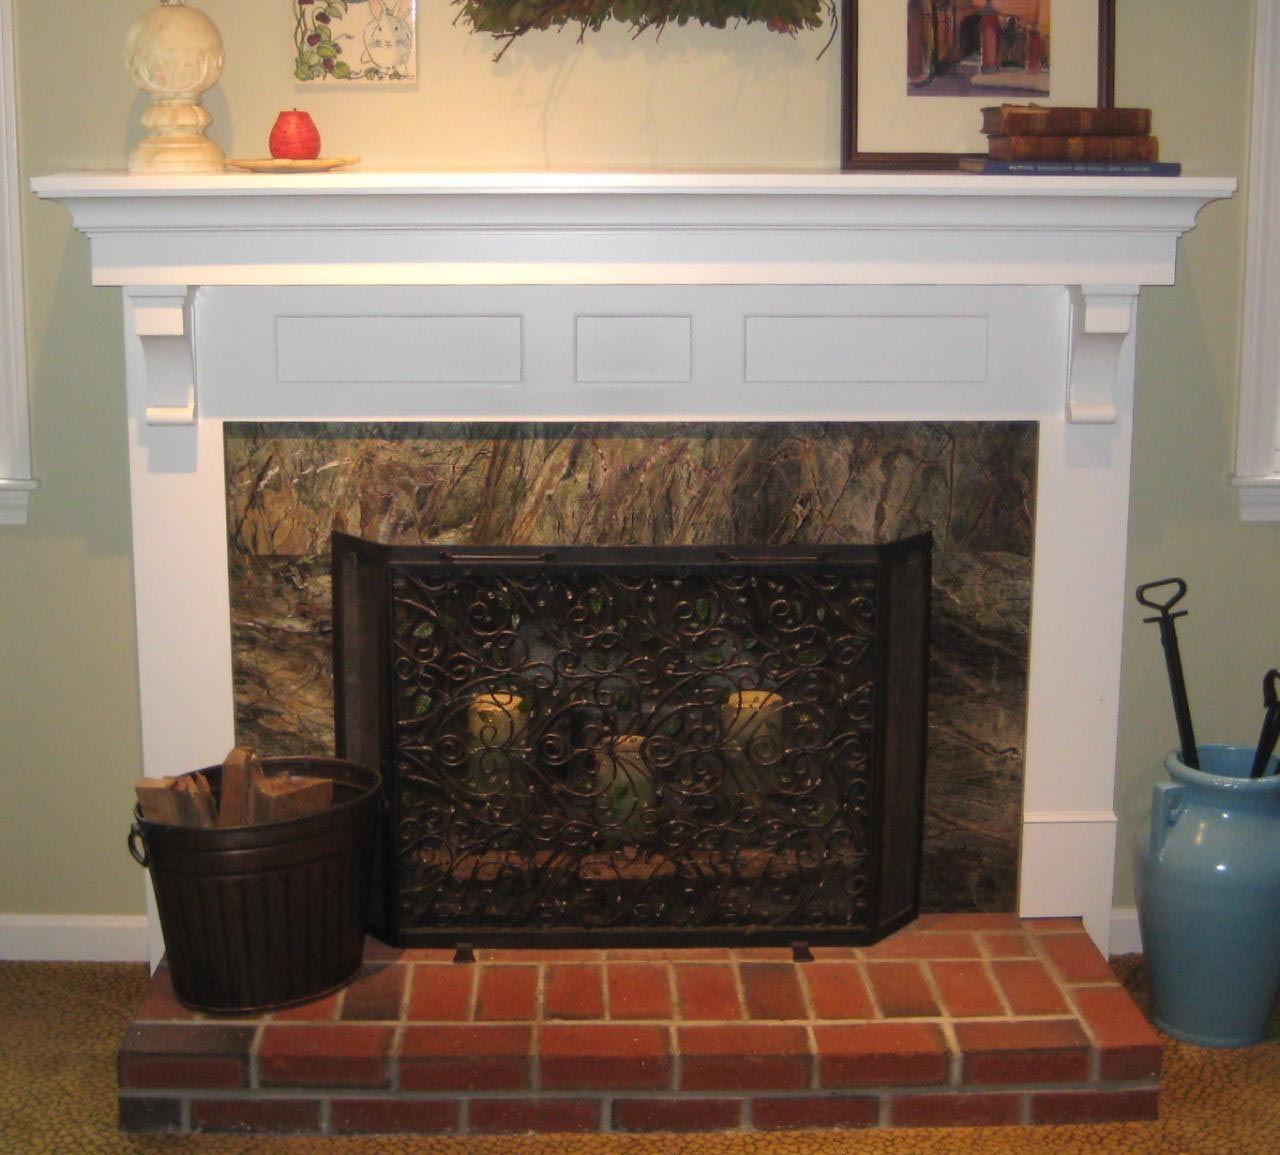 Diy Fireplace Mantel Kits Diy Fireplace Mantel Fireplace Mantel